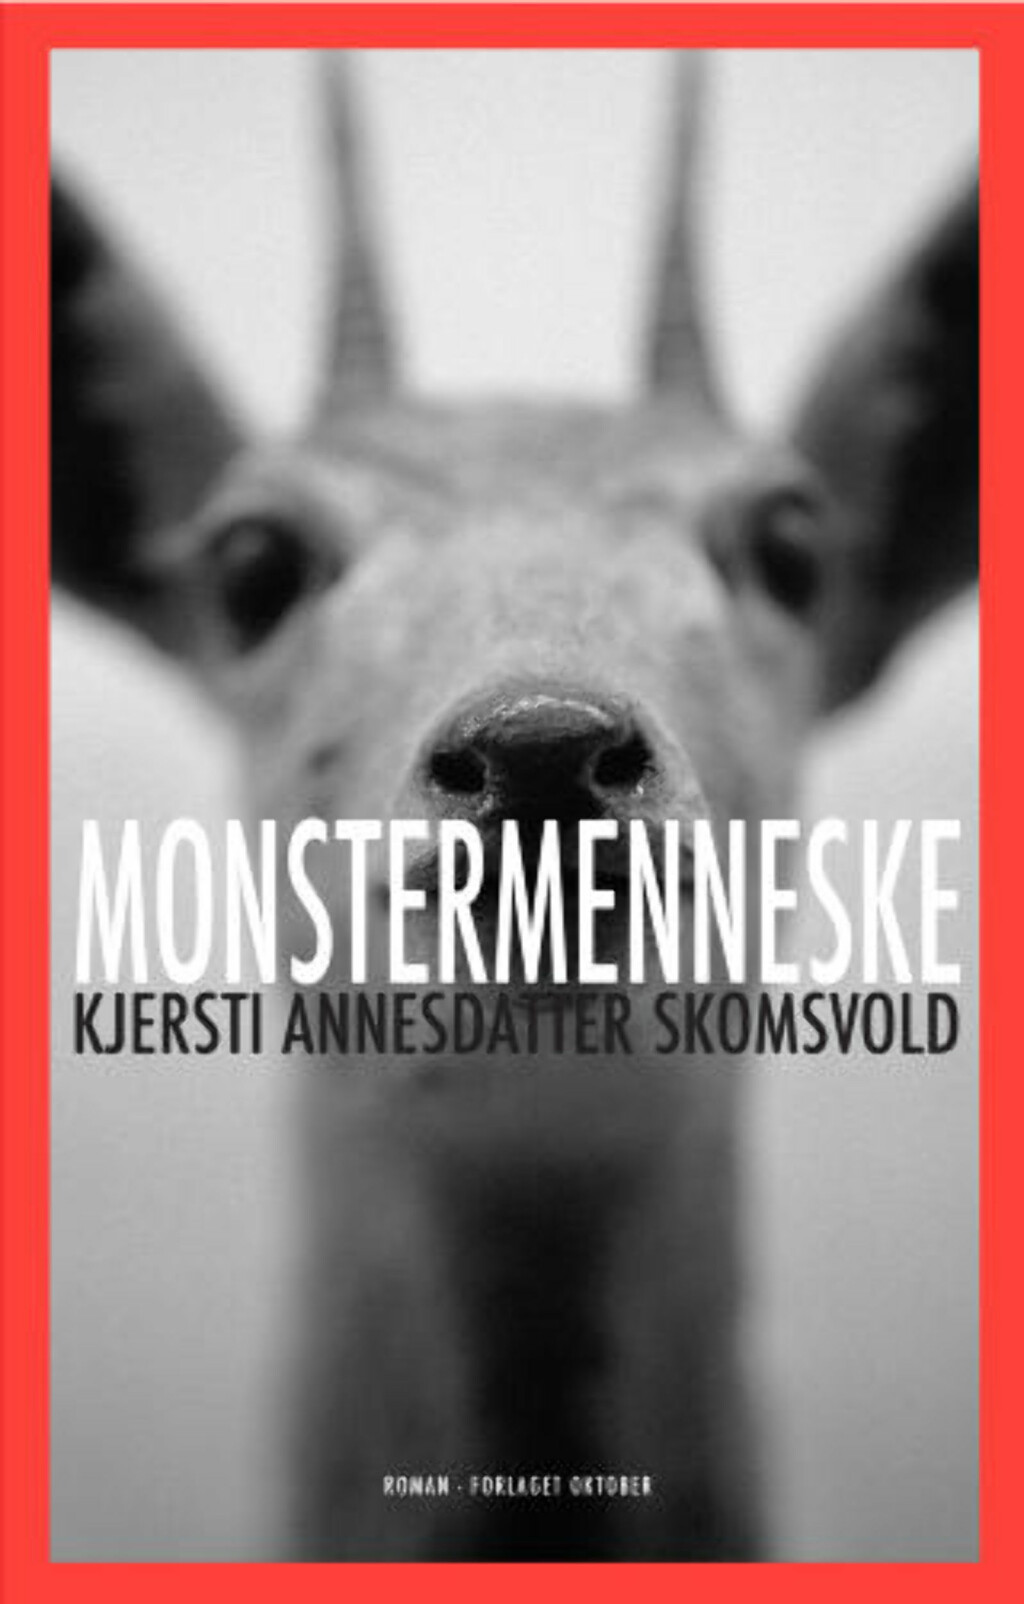 image: Årets beste roman?